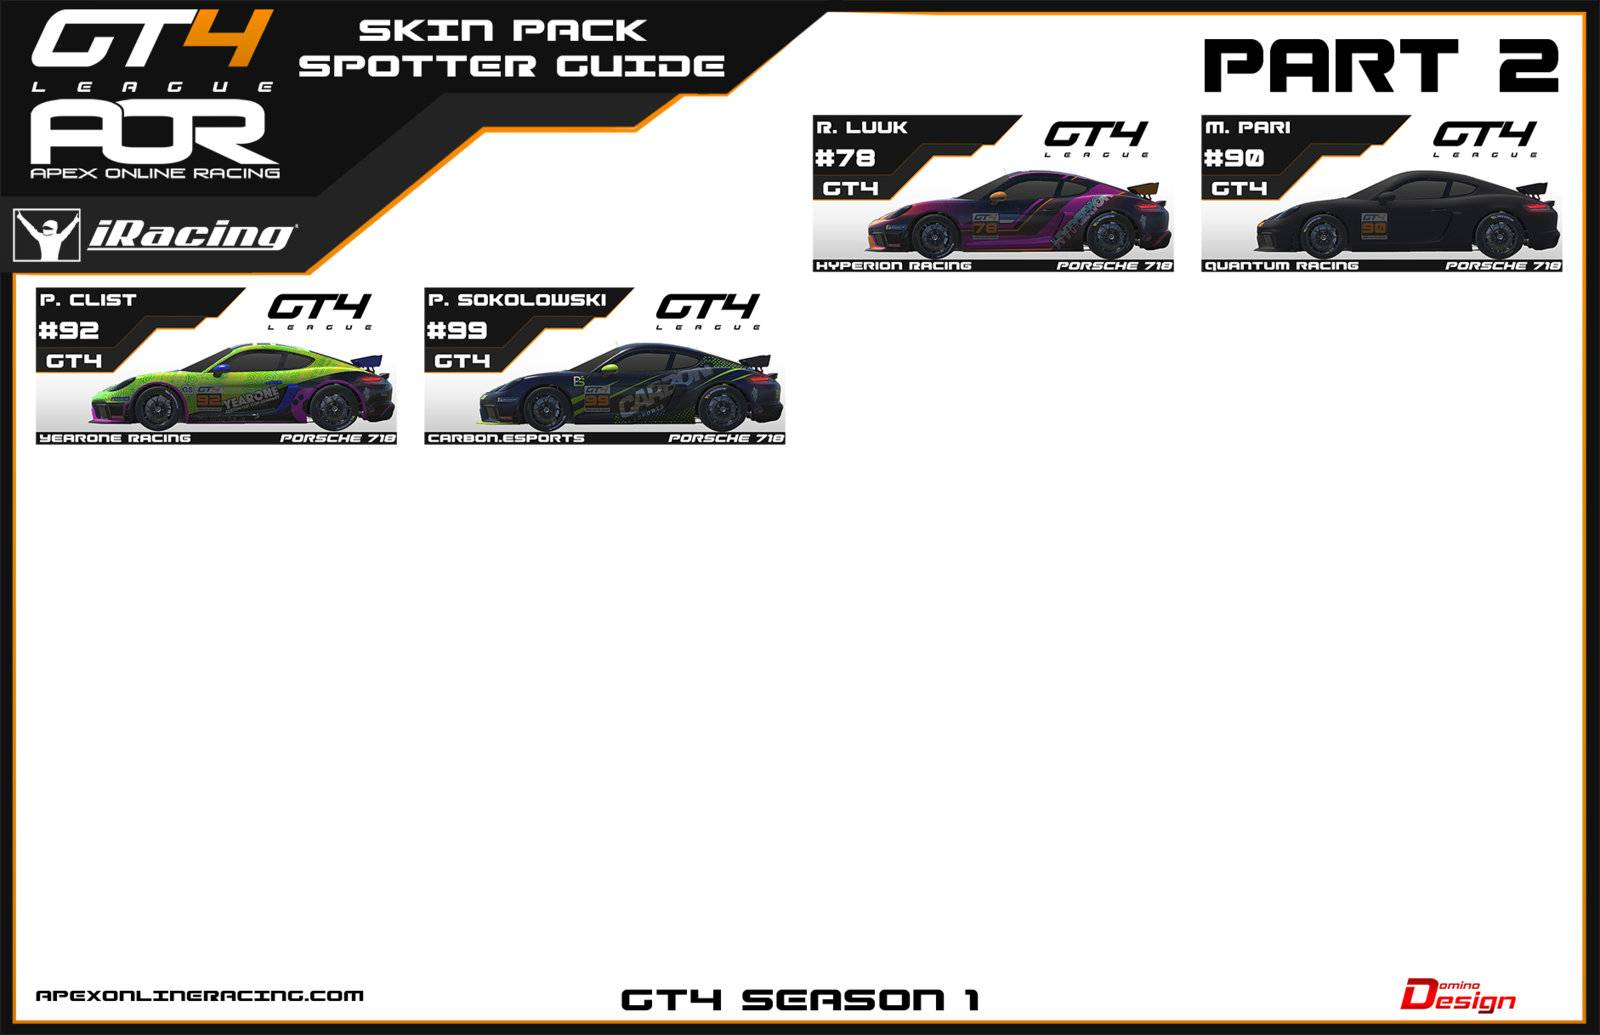 GT4 Spotters Guide Part 2.jpg